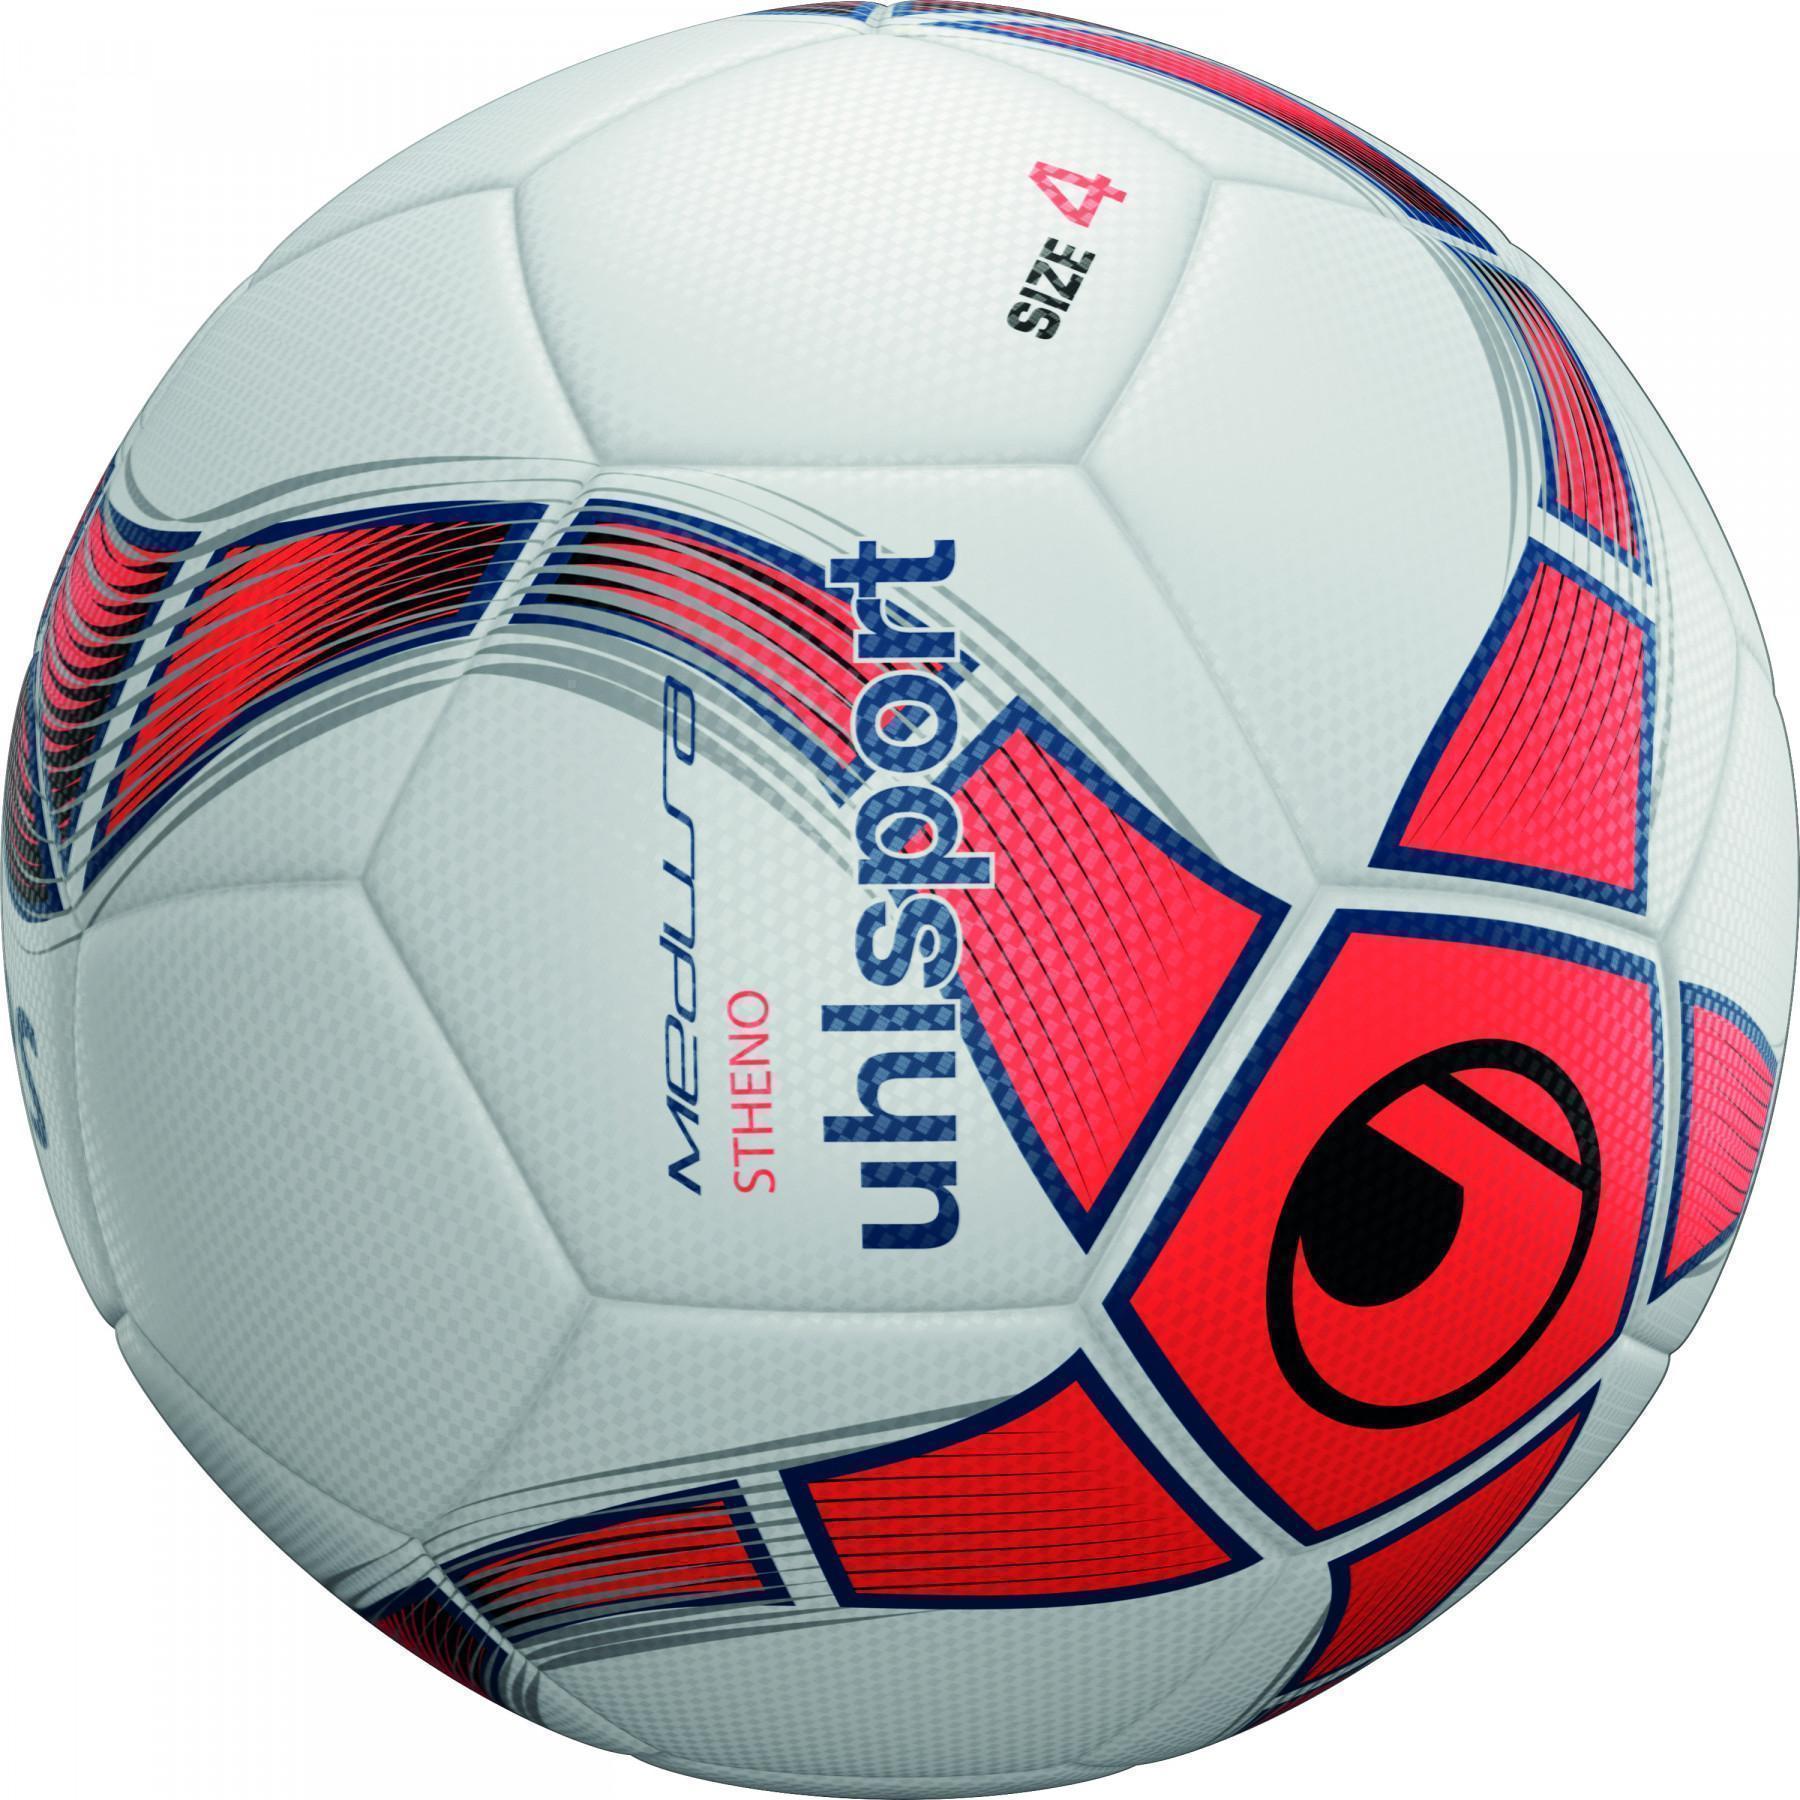 Ball Uhlsport Futsal Medusa Stheno